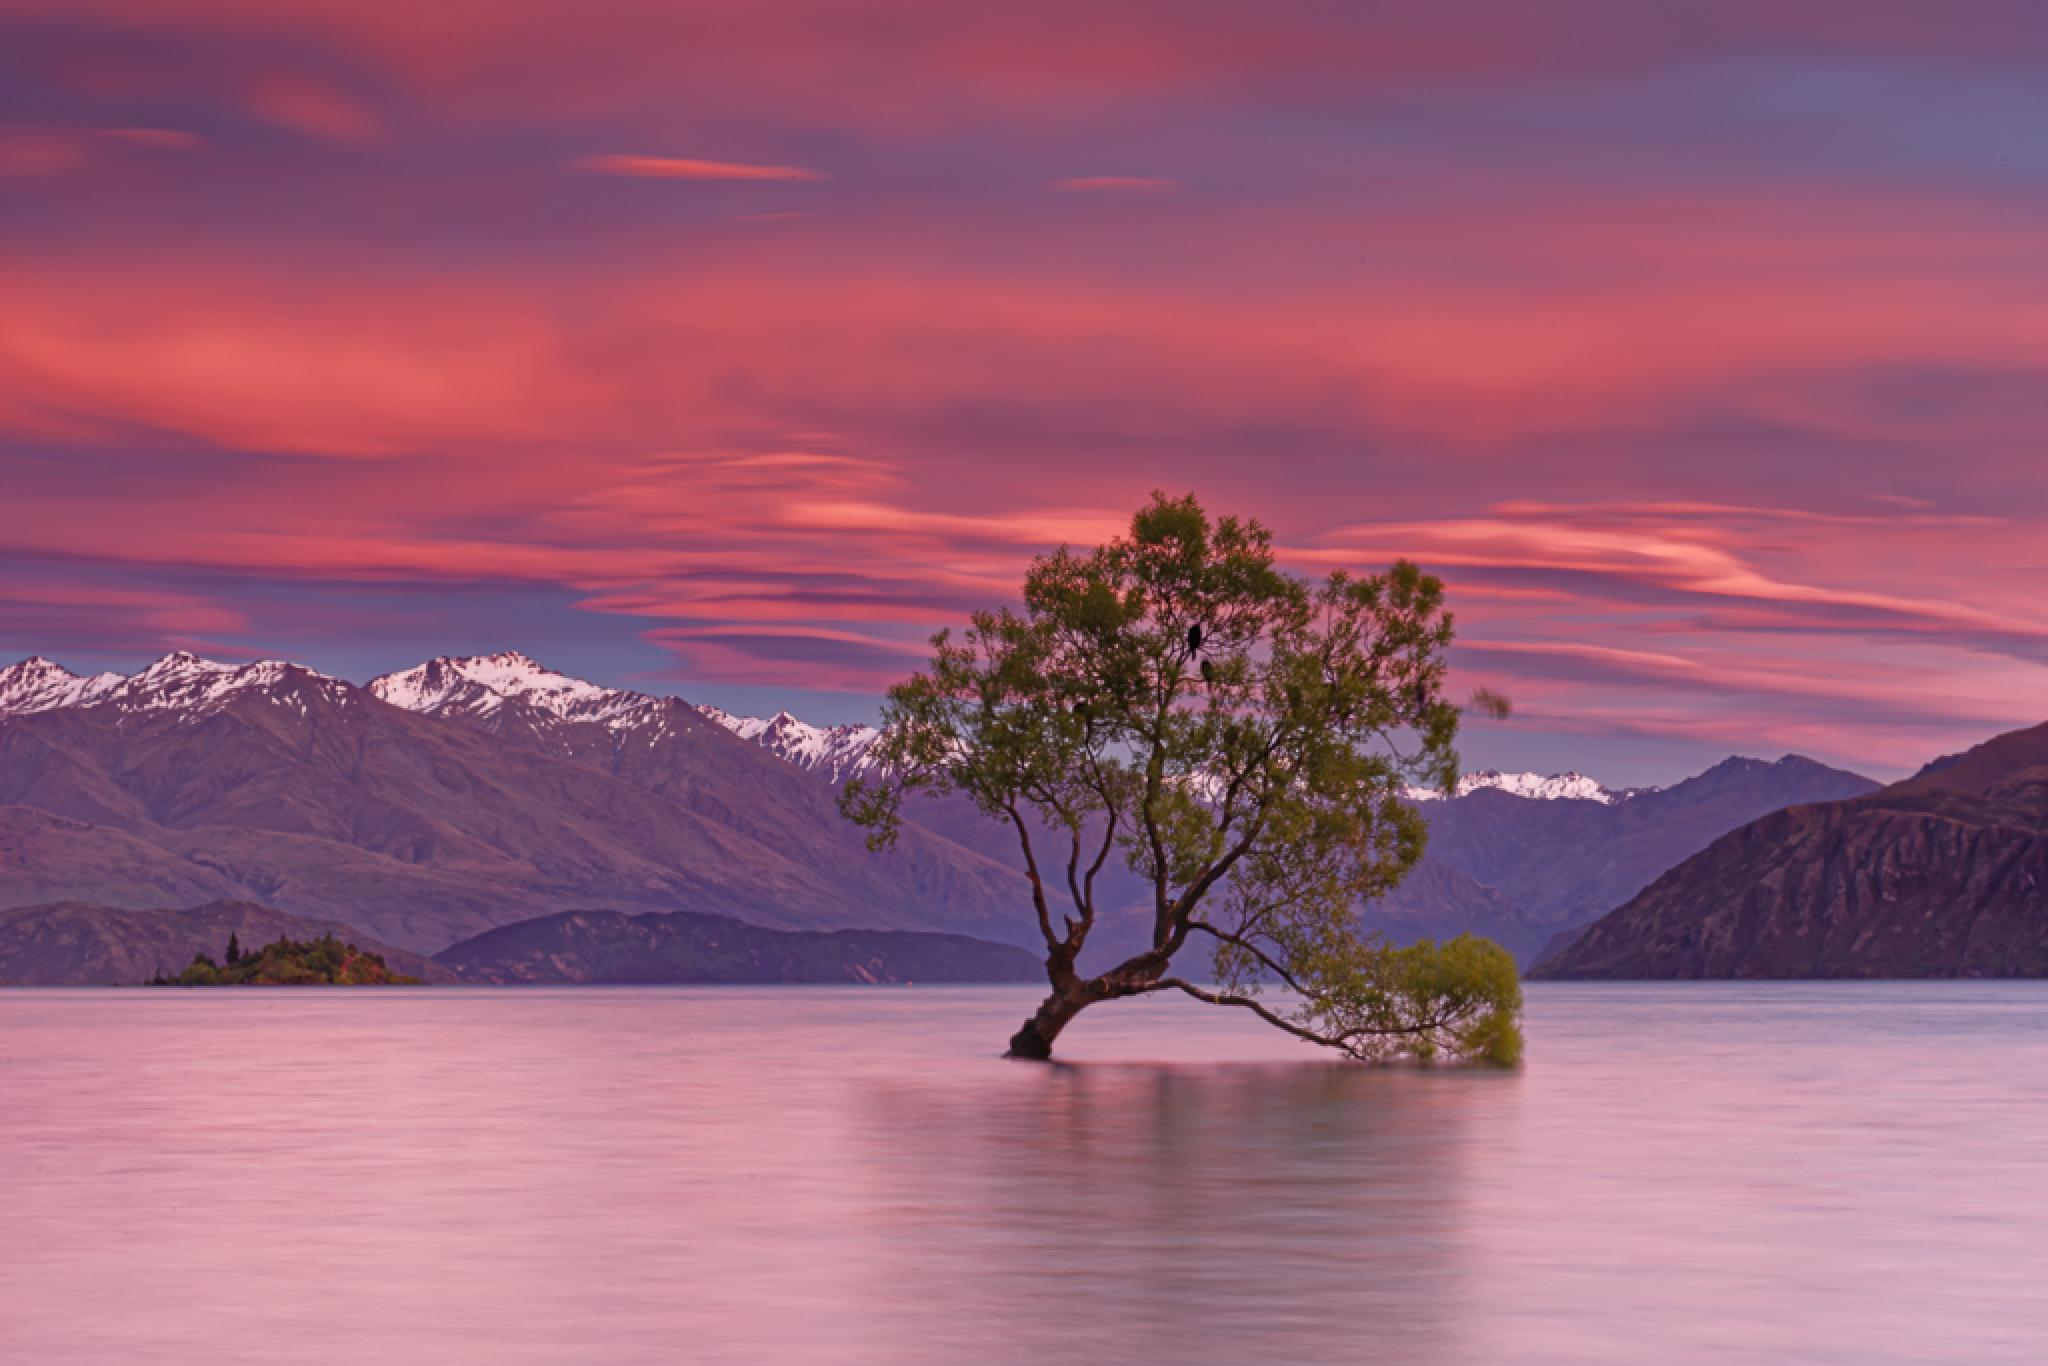 Lonely Tree in lake Wanaka by James Zhen